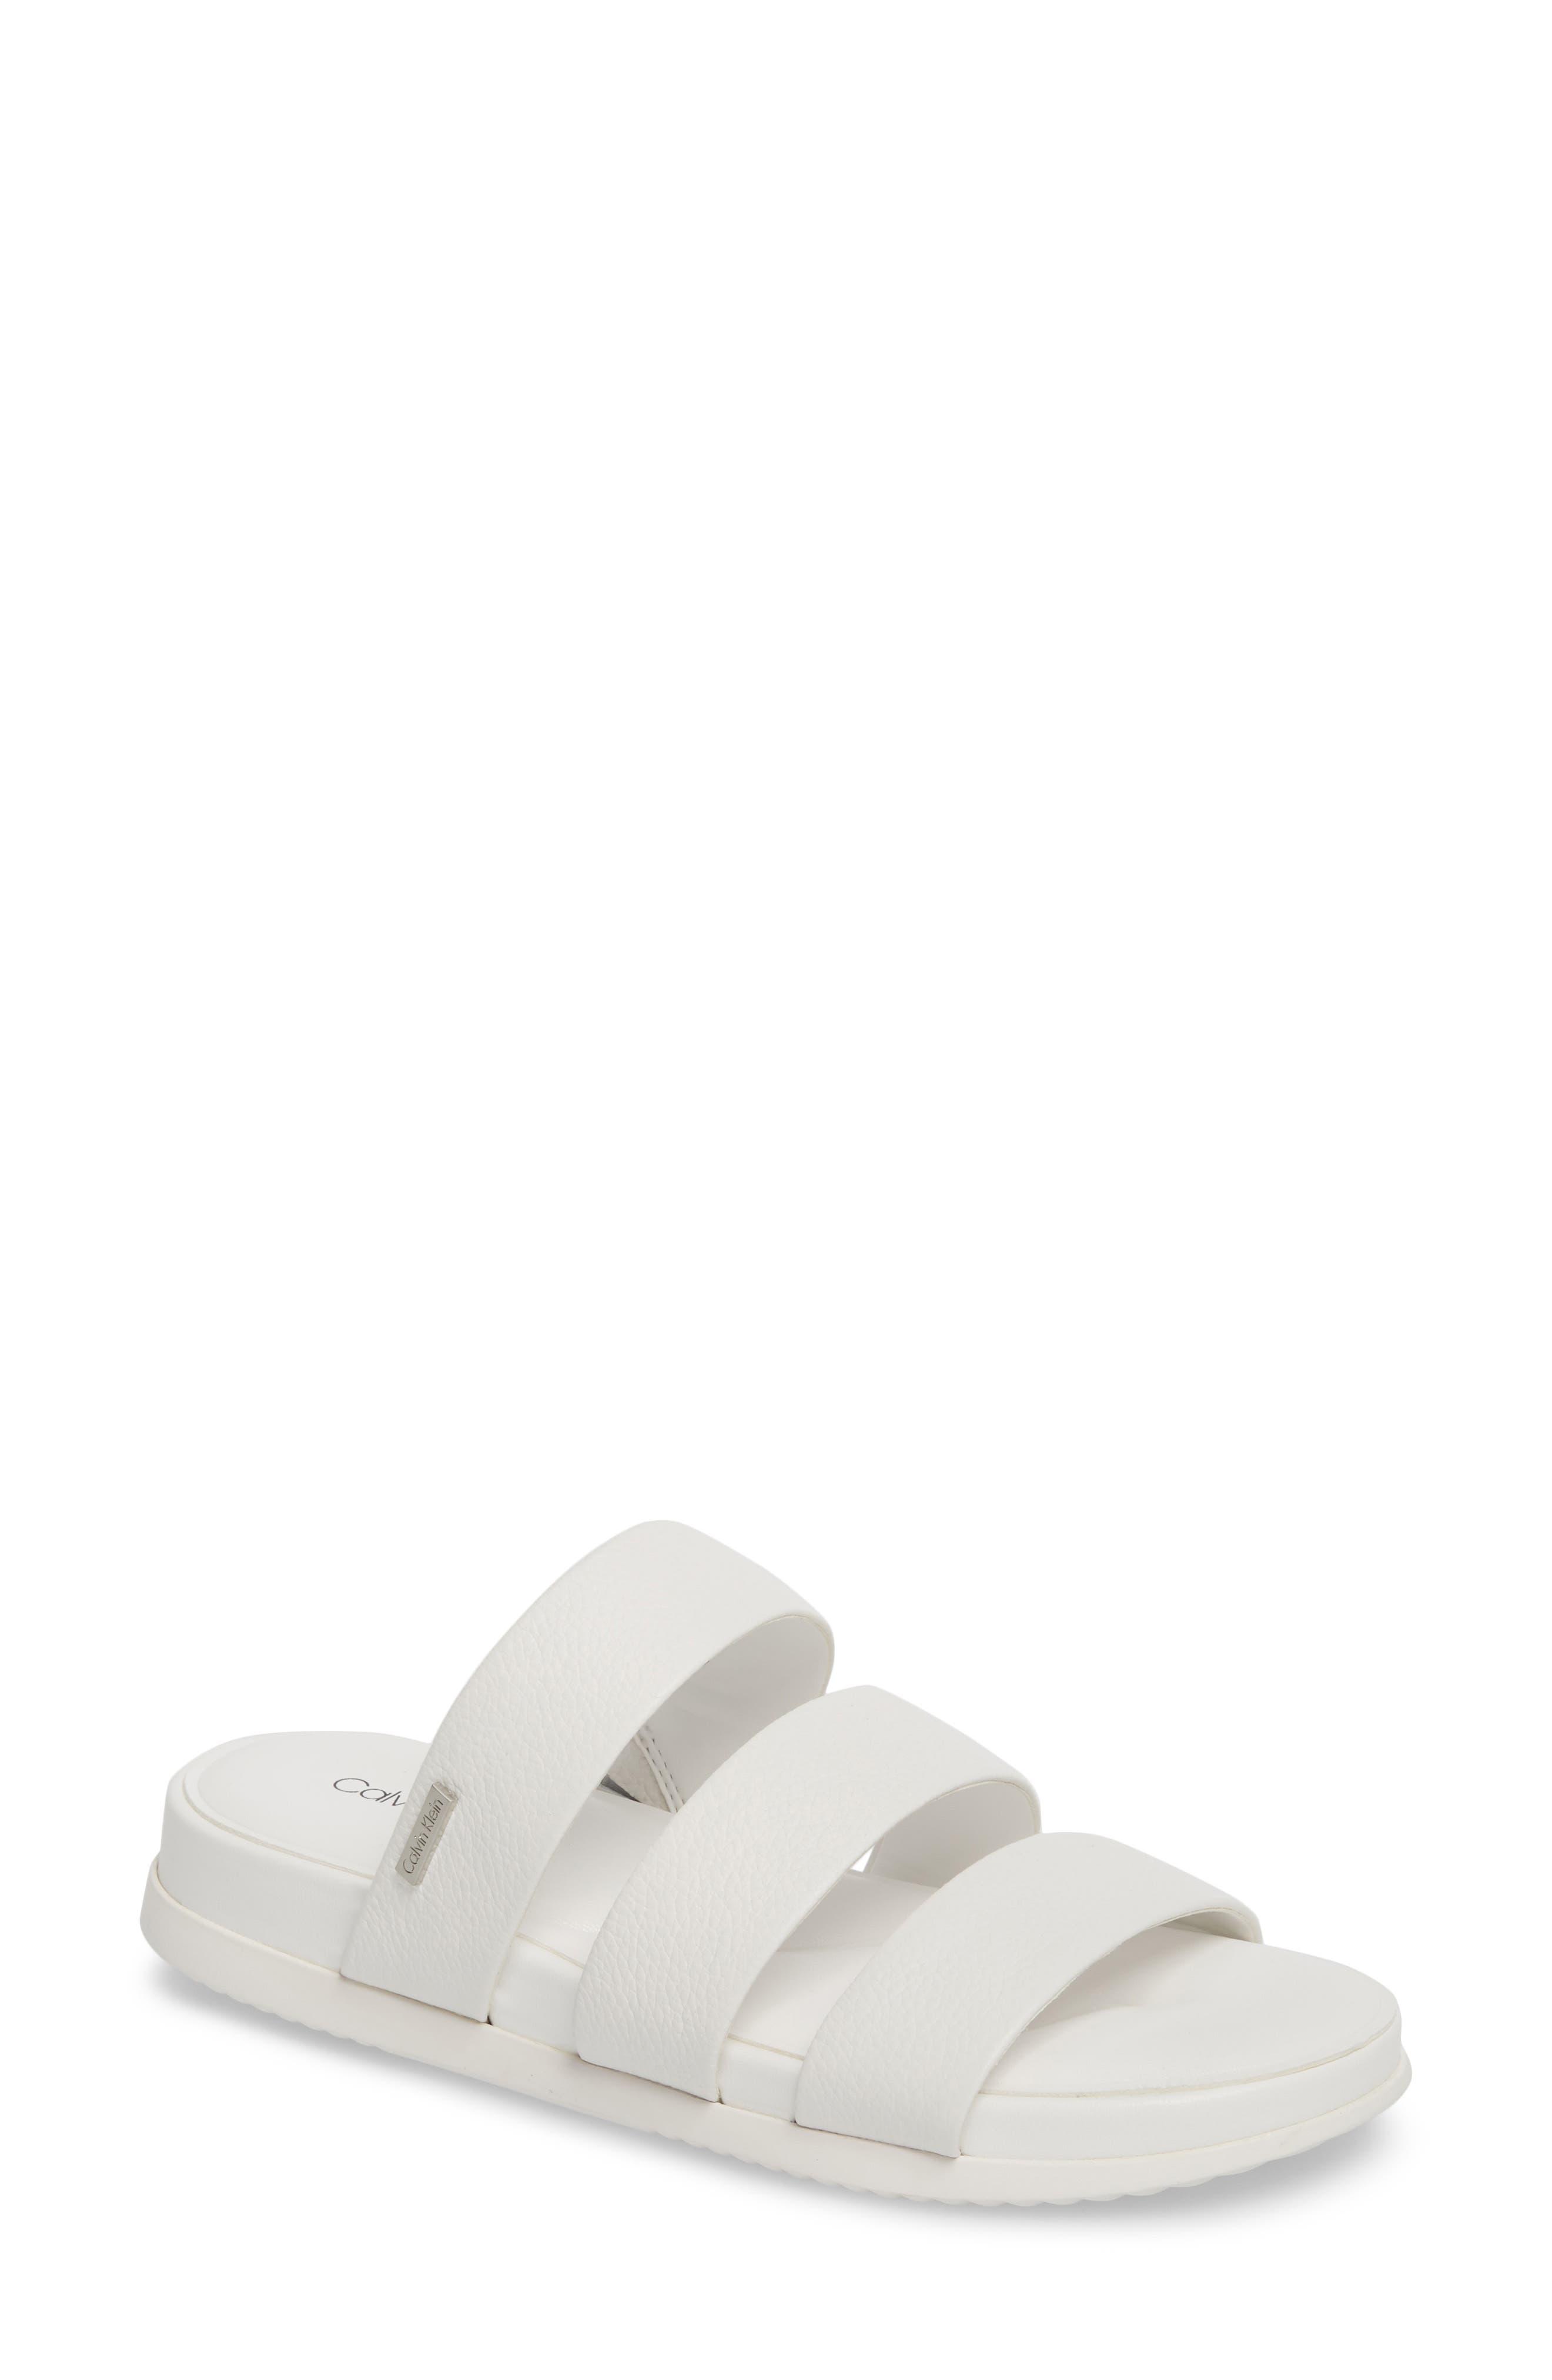 Dalana Slide Sandal,                         Main,                         color, Platinum White Pebble Leather